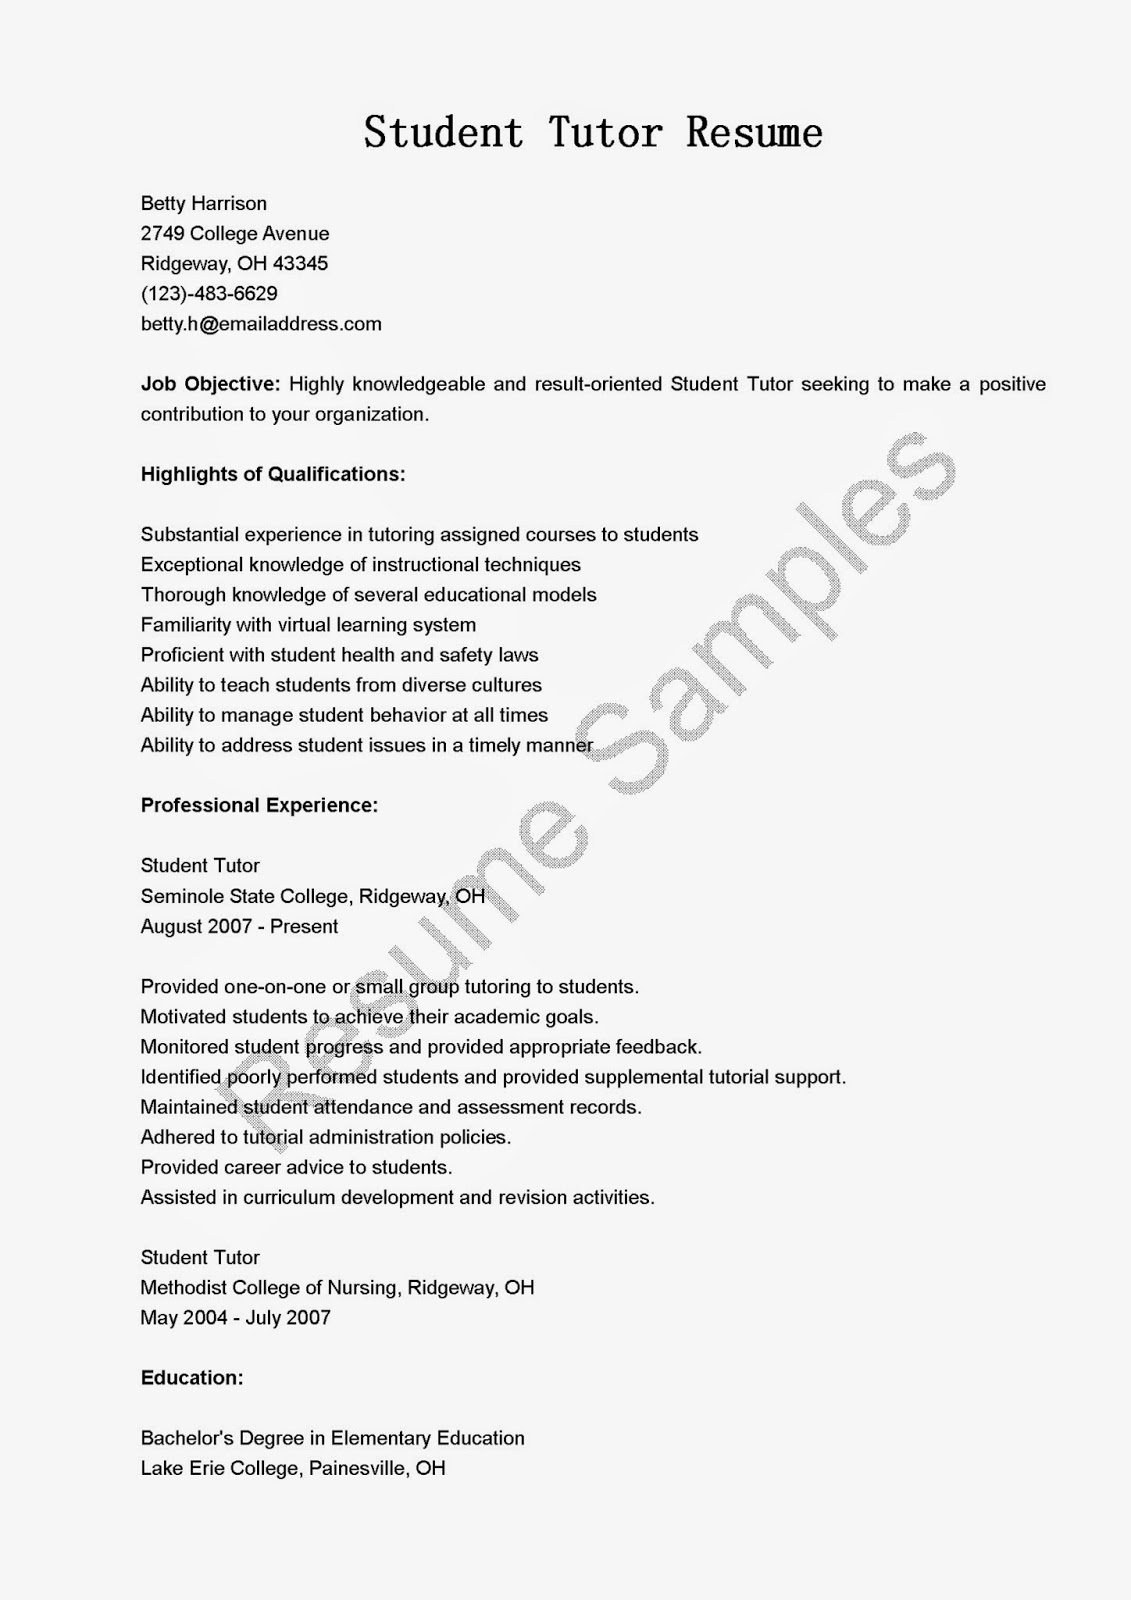 Resume Samples Student Tutor Sample